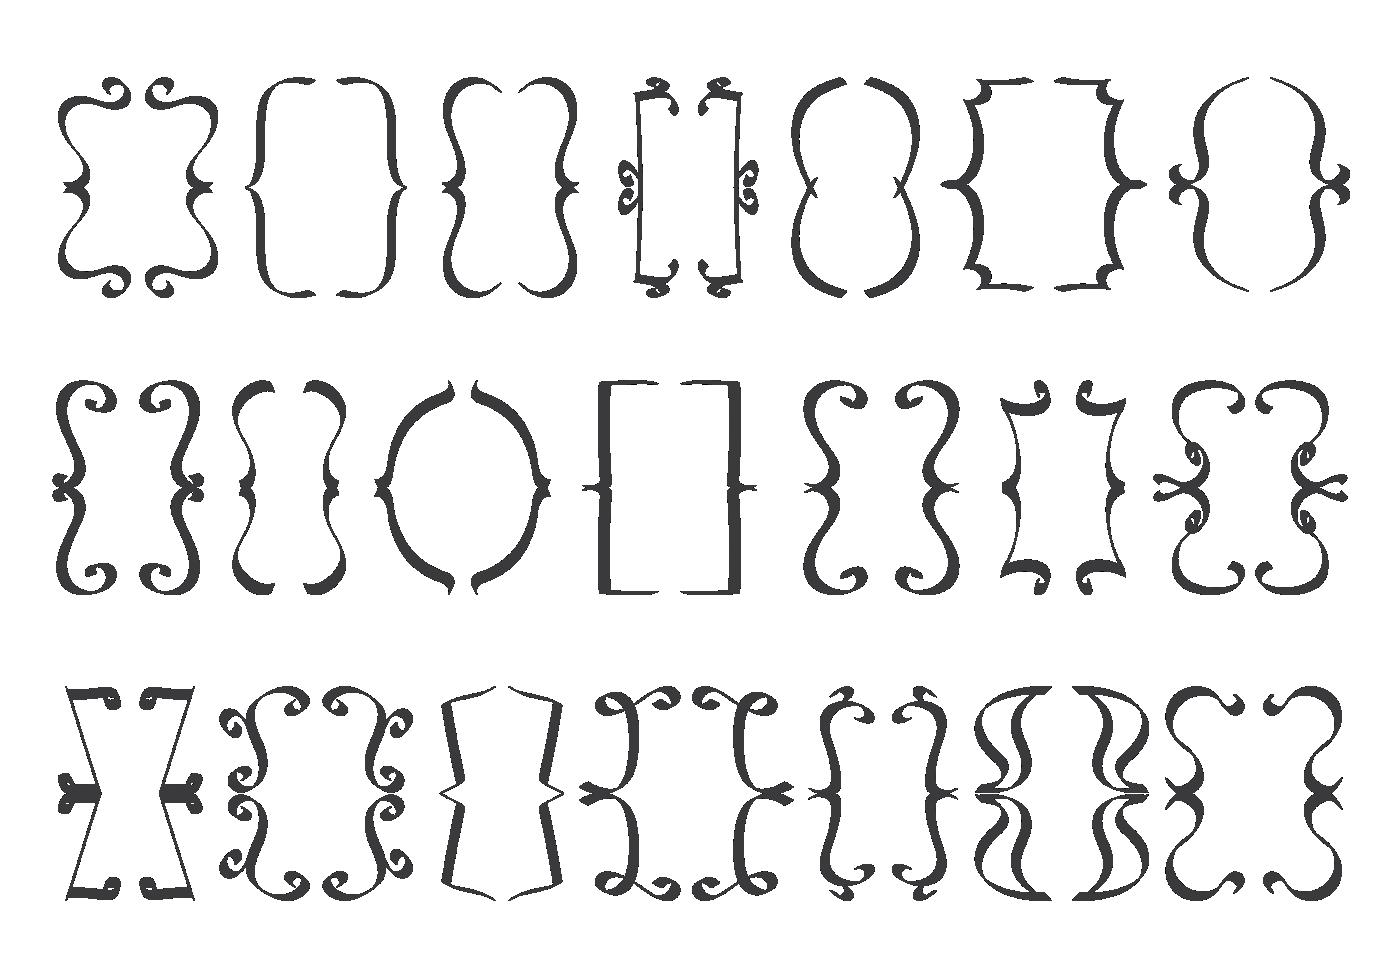 Brackets Free Vector Art - (8,654 Free Downloads)